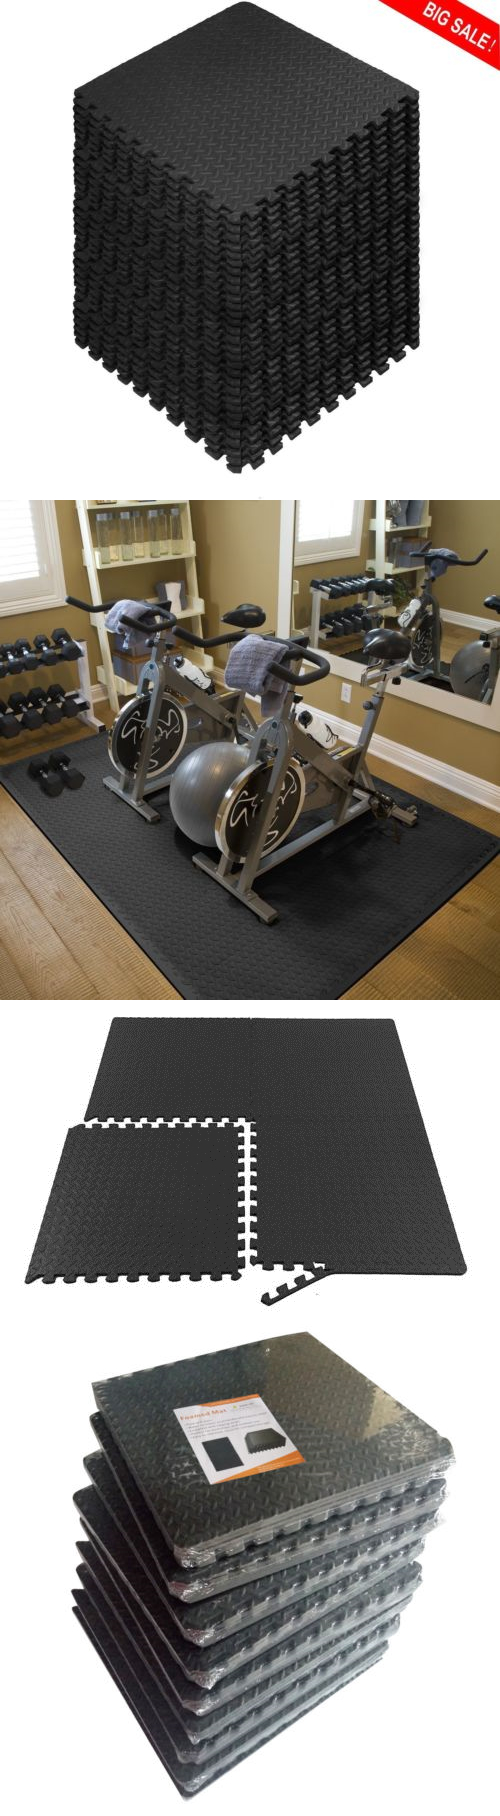 Exercise mats 44079 lot54 eva foam floor mat interlocking exercise exercise mats 44079 lot54 eva foam floor mat interlocking exercise gym puzzle tiles 216sq ft dailygadgetfo Gallery